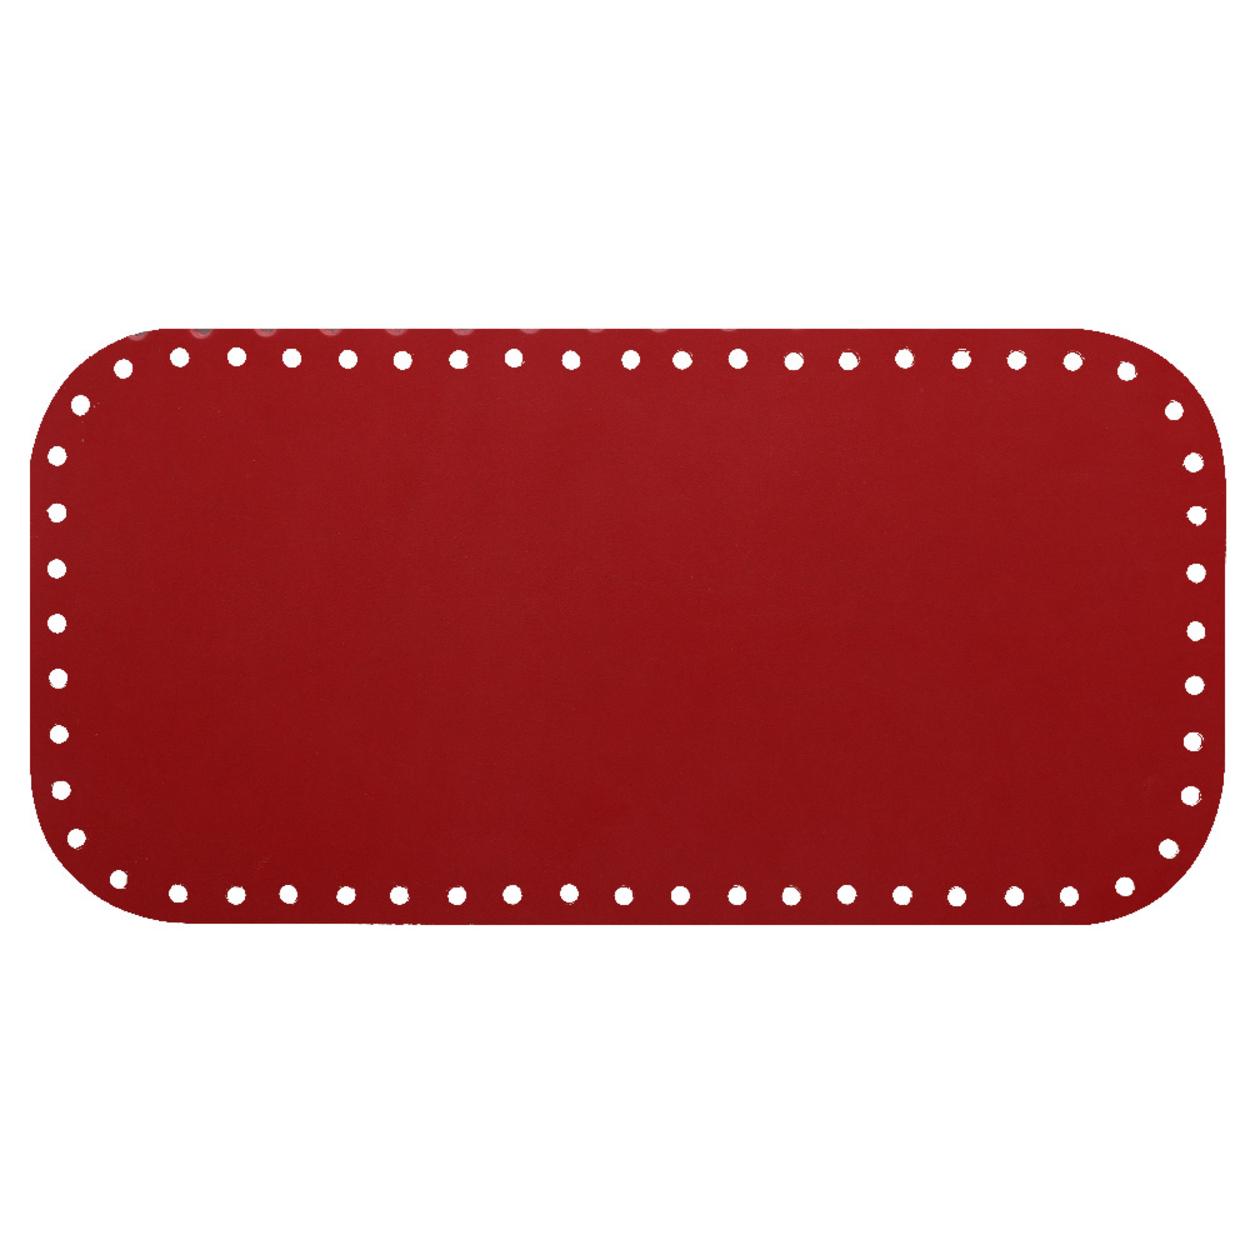 Кожа — Дно для сумки 15 х 30 см. Red hot